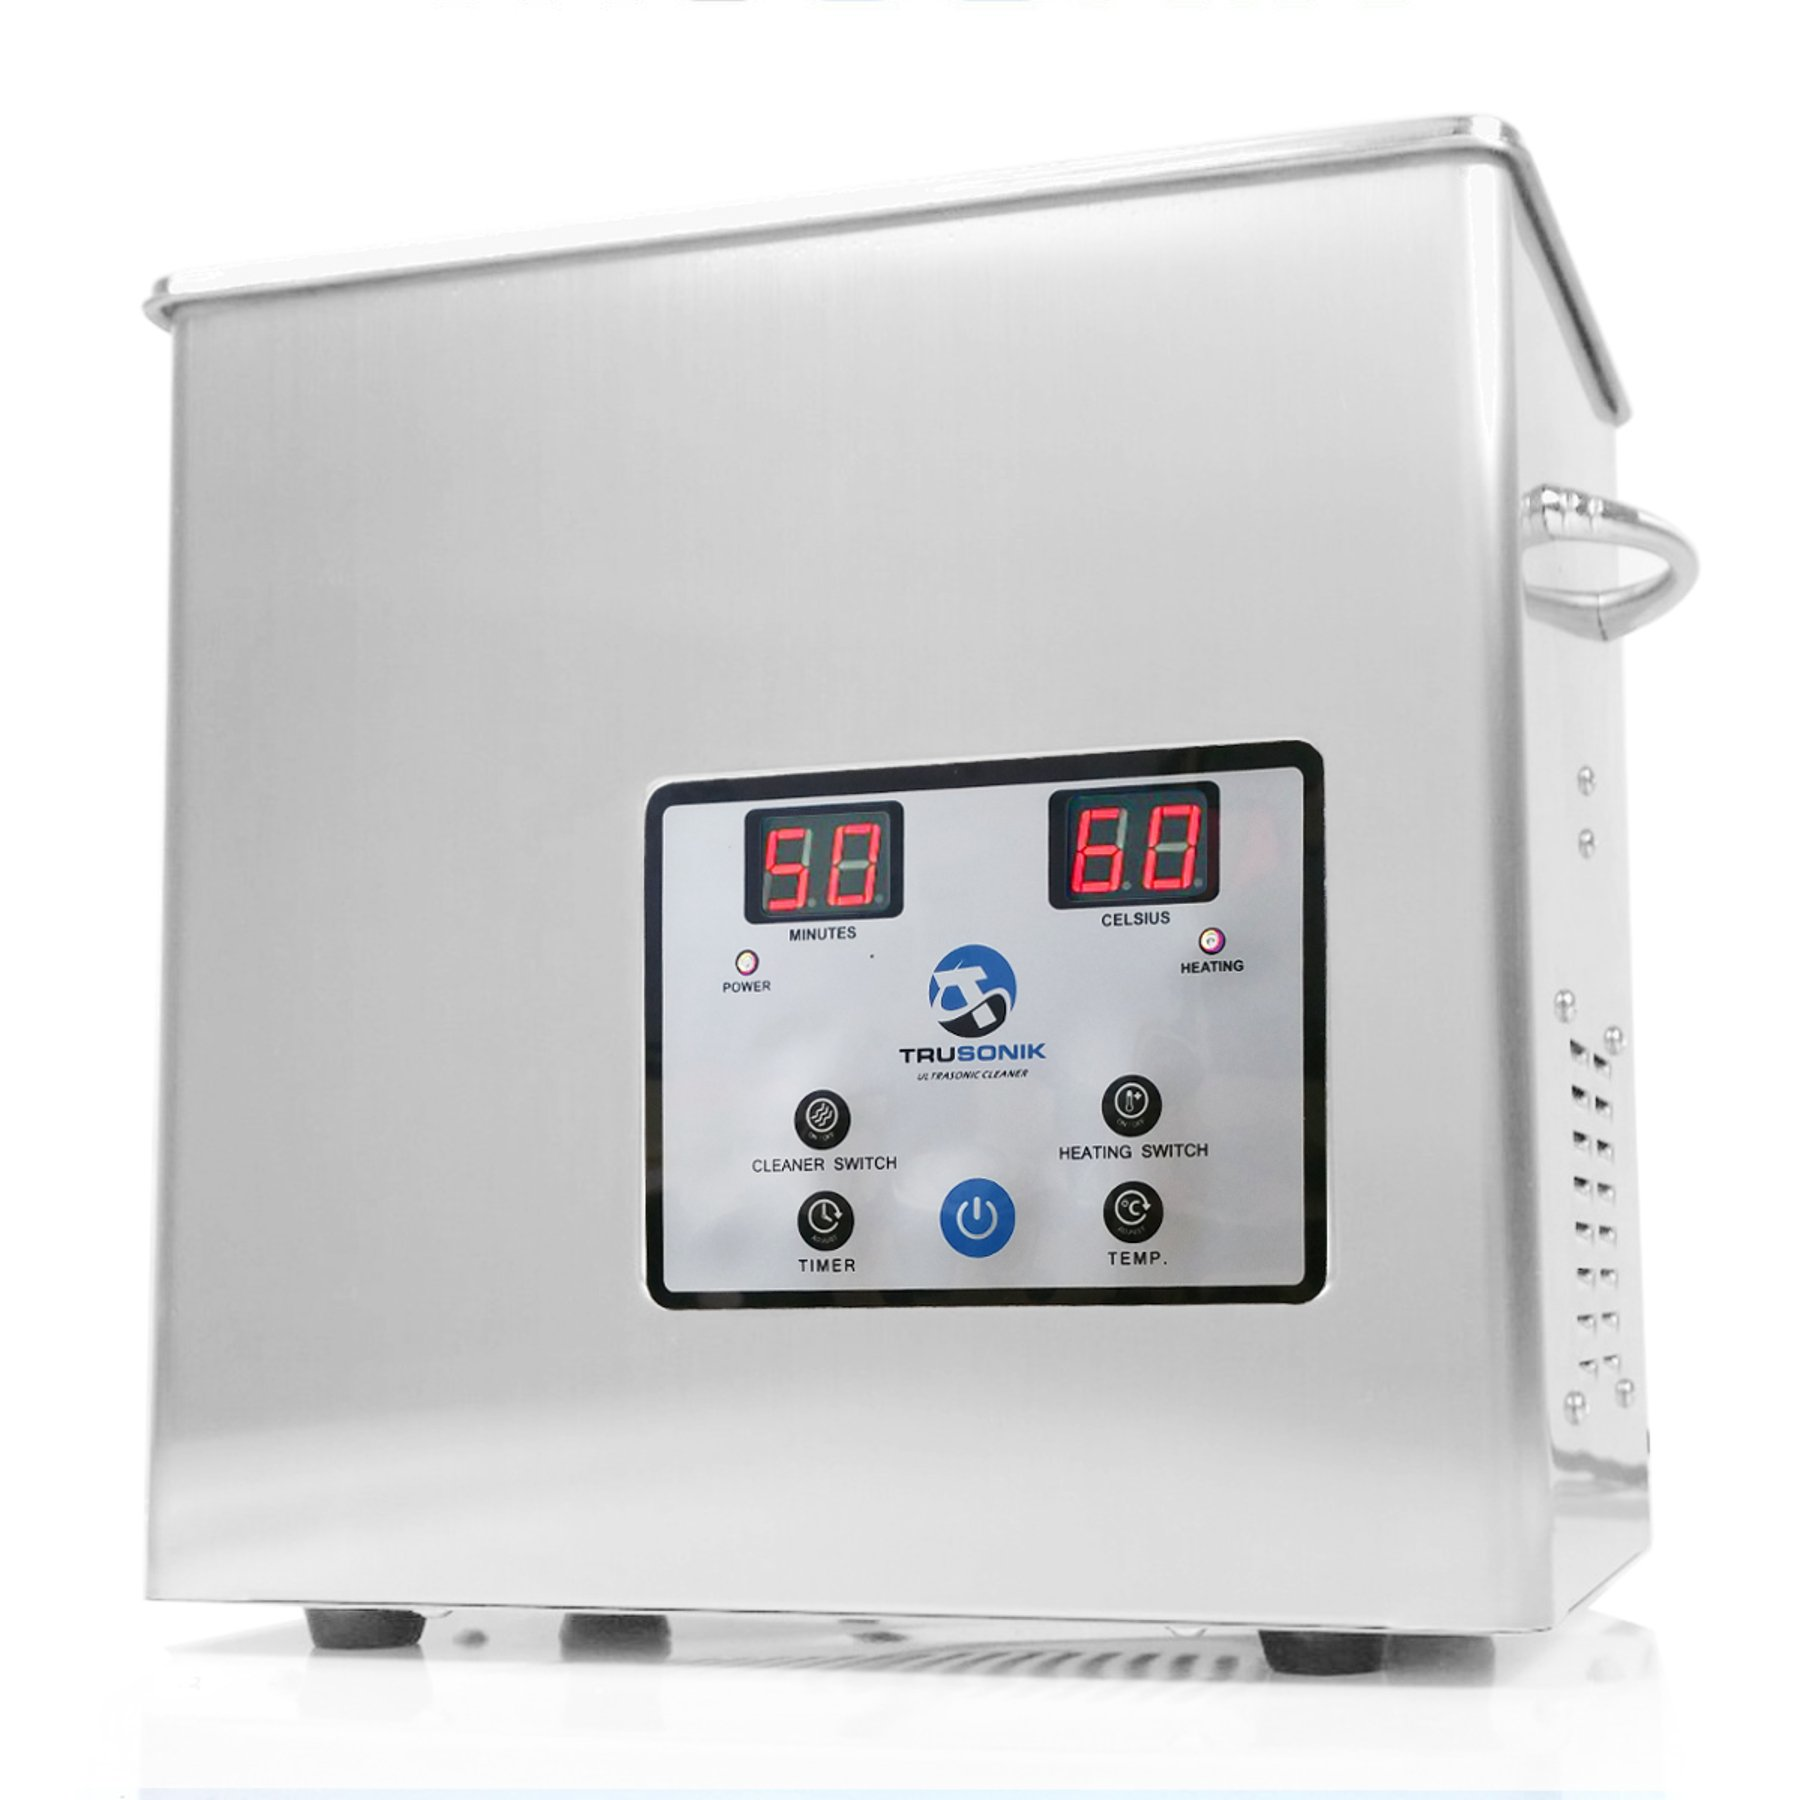 TruSonik 2.5L Digital Ultrasonic Cleaner With Heater   Industrial Stainless Steel Body, Tub, & Basket   Cleans Jewellery, Dental & Tattoo Equipment, Guns & Gun Parts, Car Parts & Carbs, & More by TruSonik